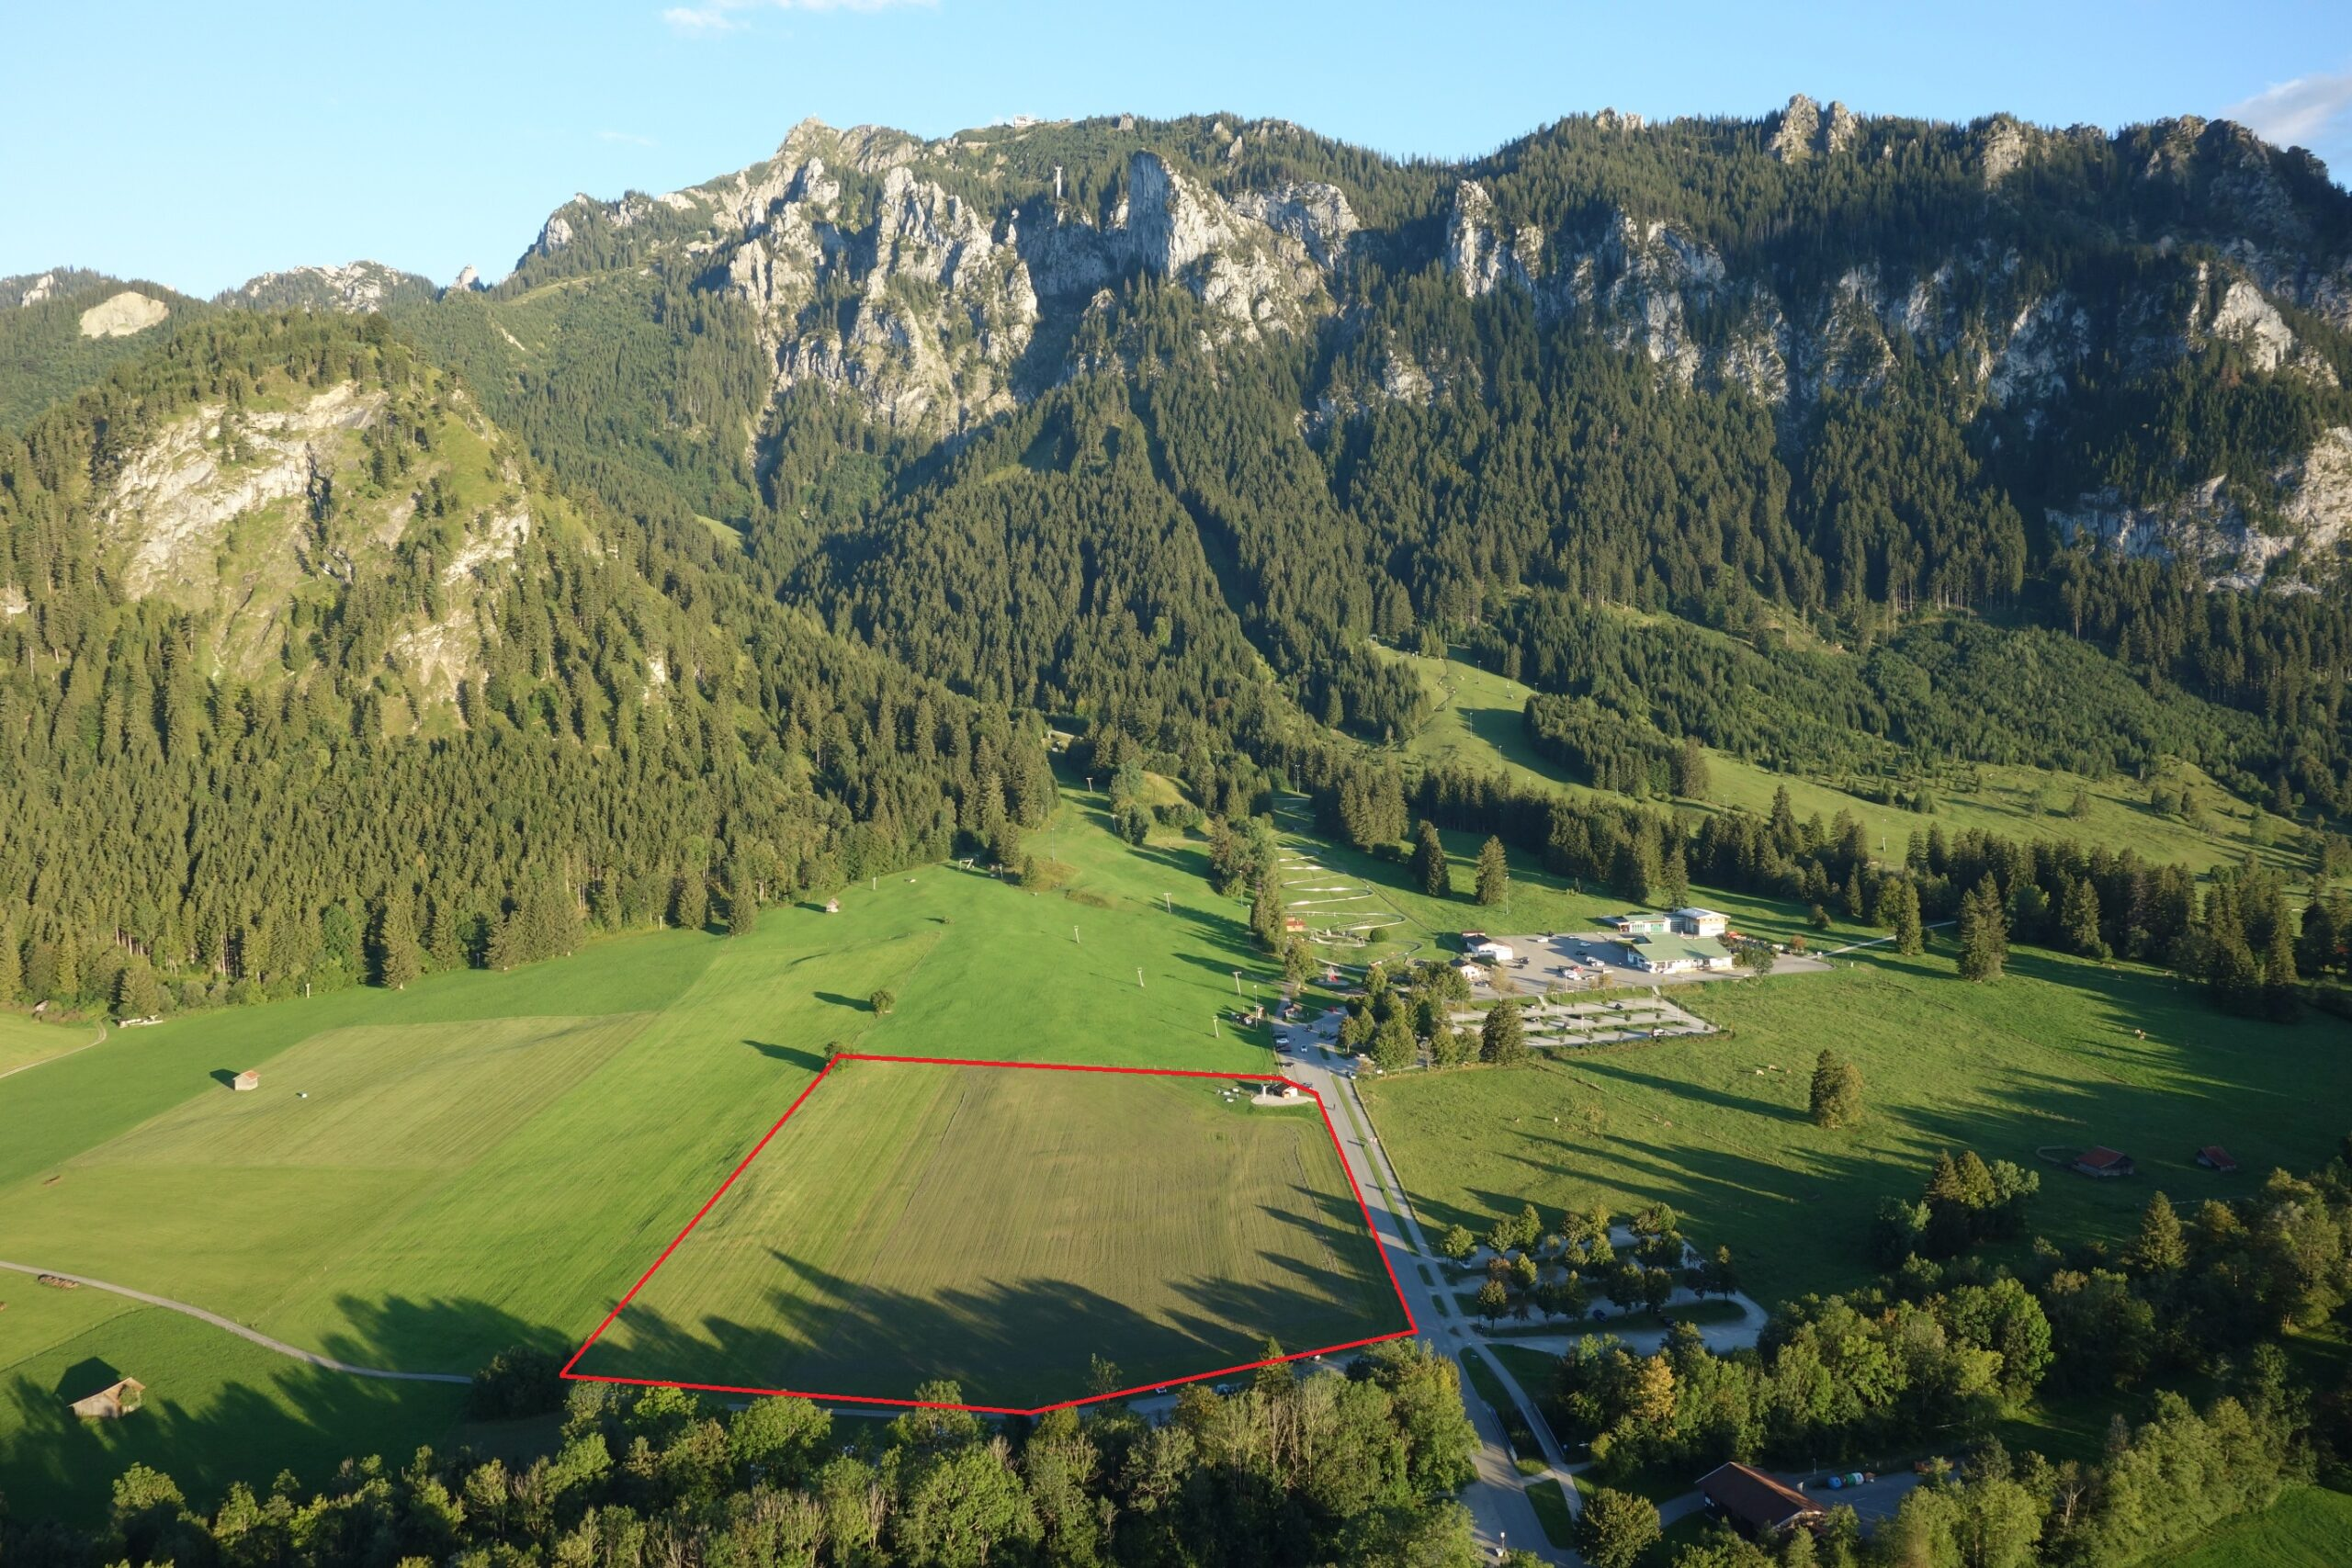 Landeplatz Tegelberg